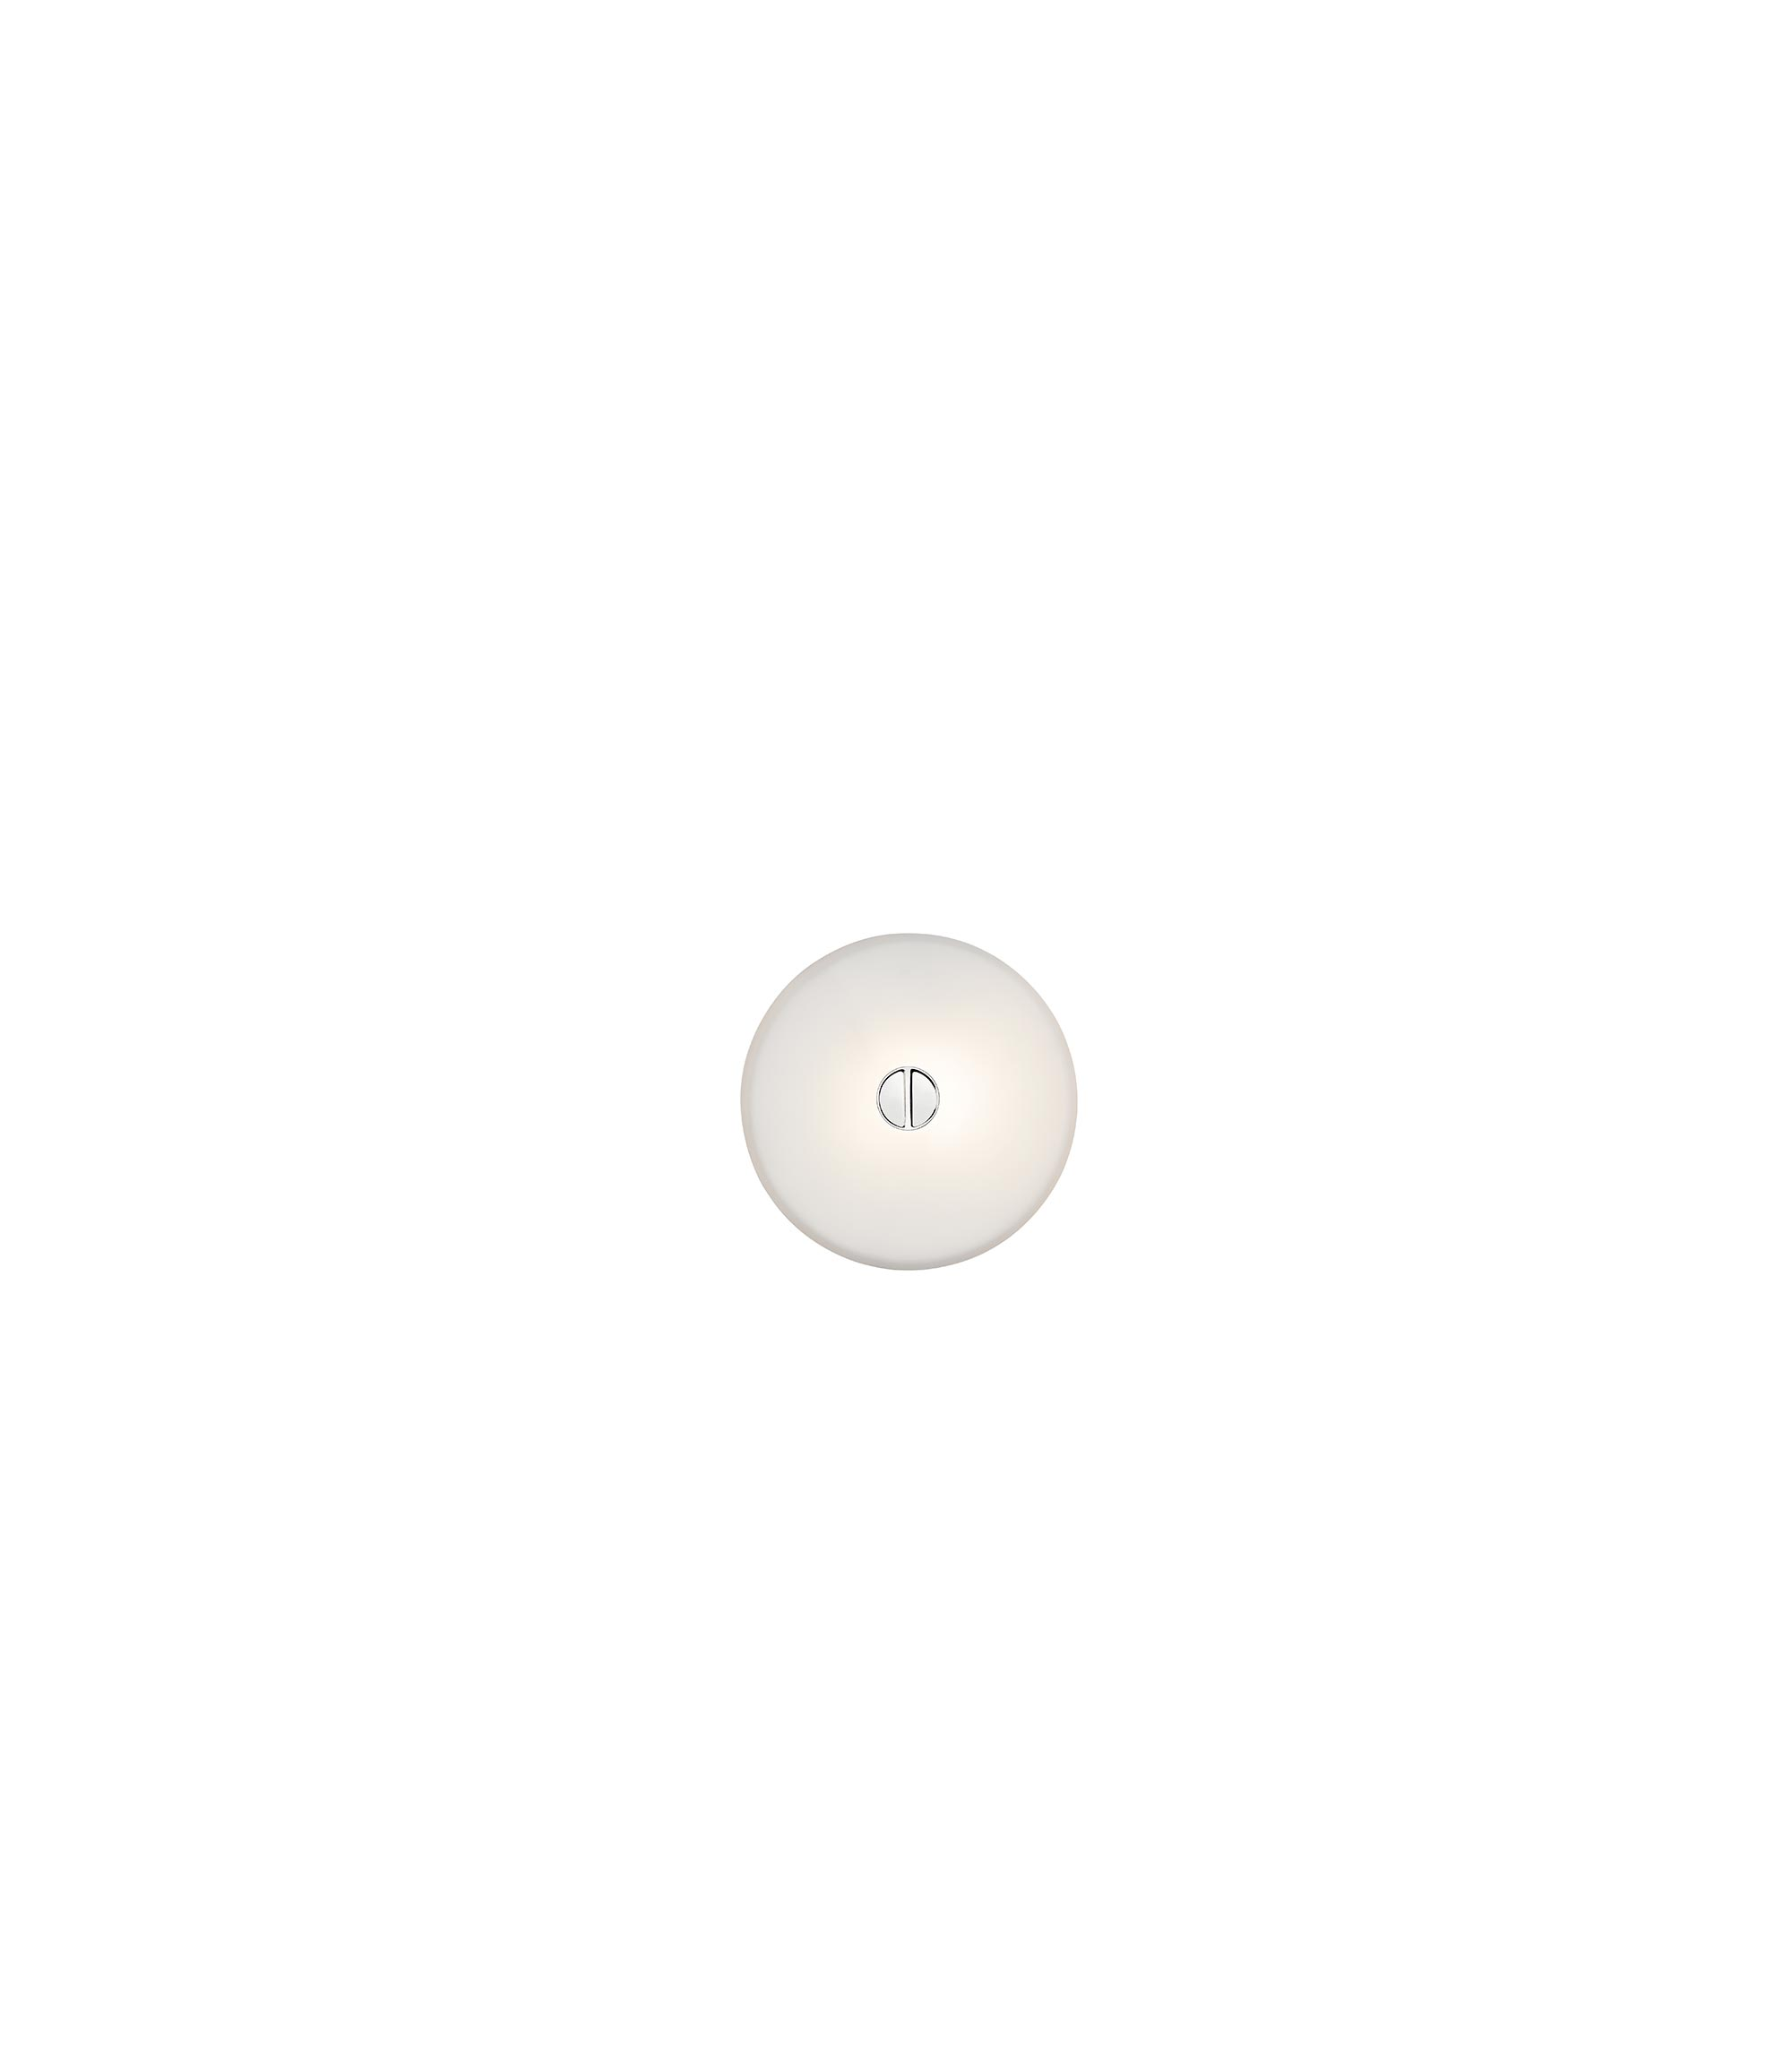 Mini button ceiling wall lissoni flos F1490009 product still life big 1